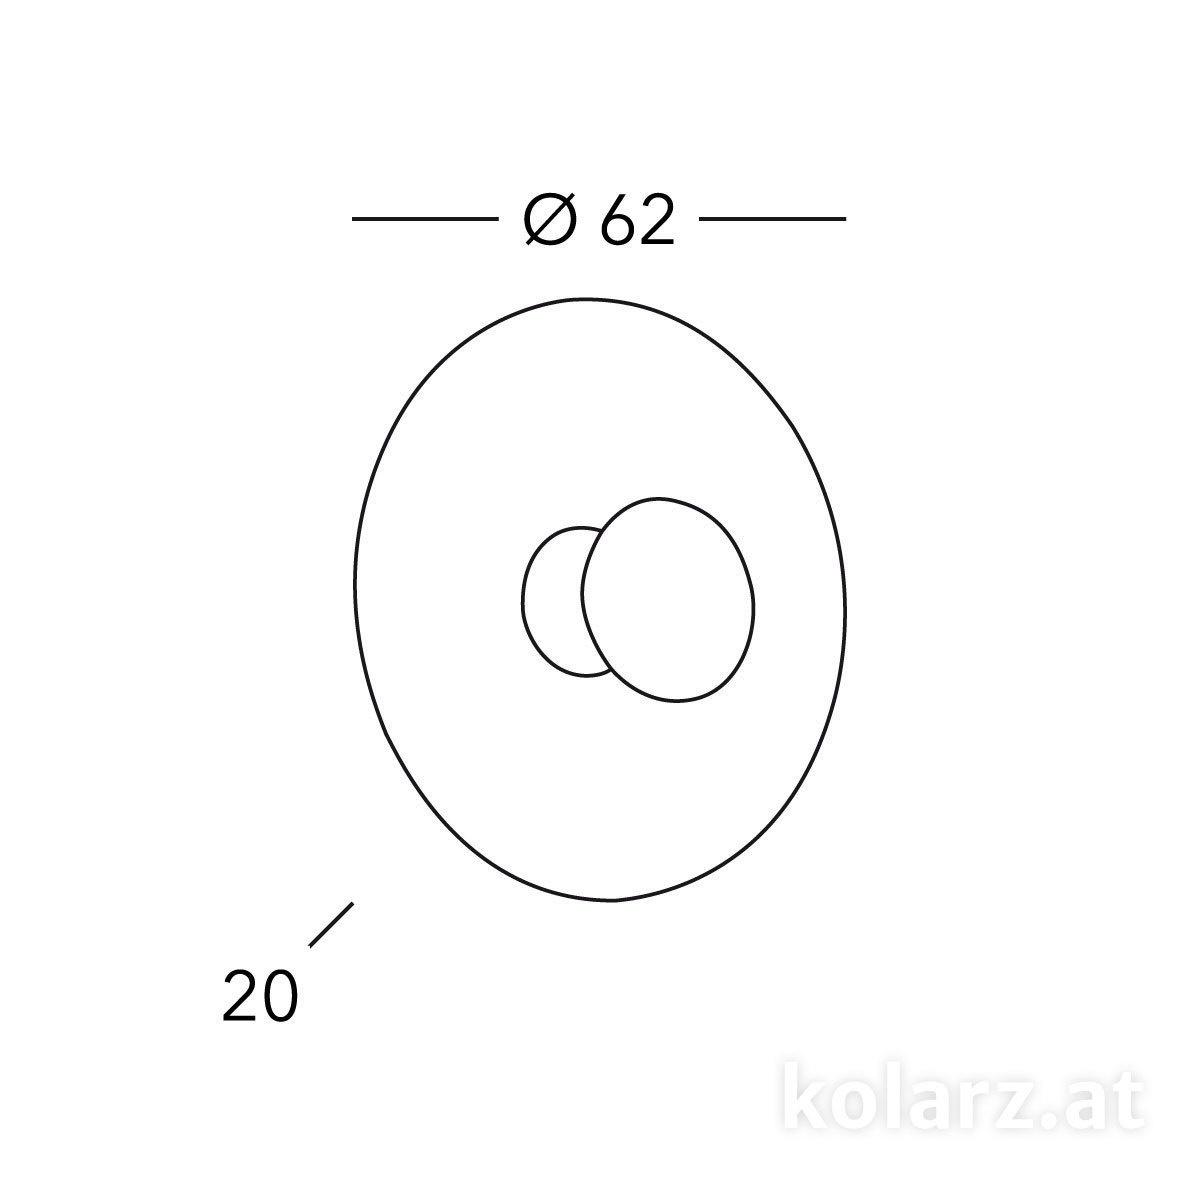 0415-61XL-V1-3-RV-s1.jpg